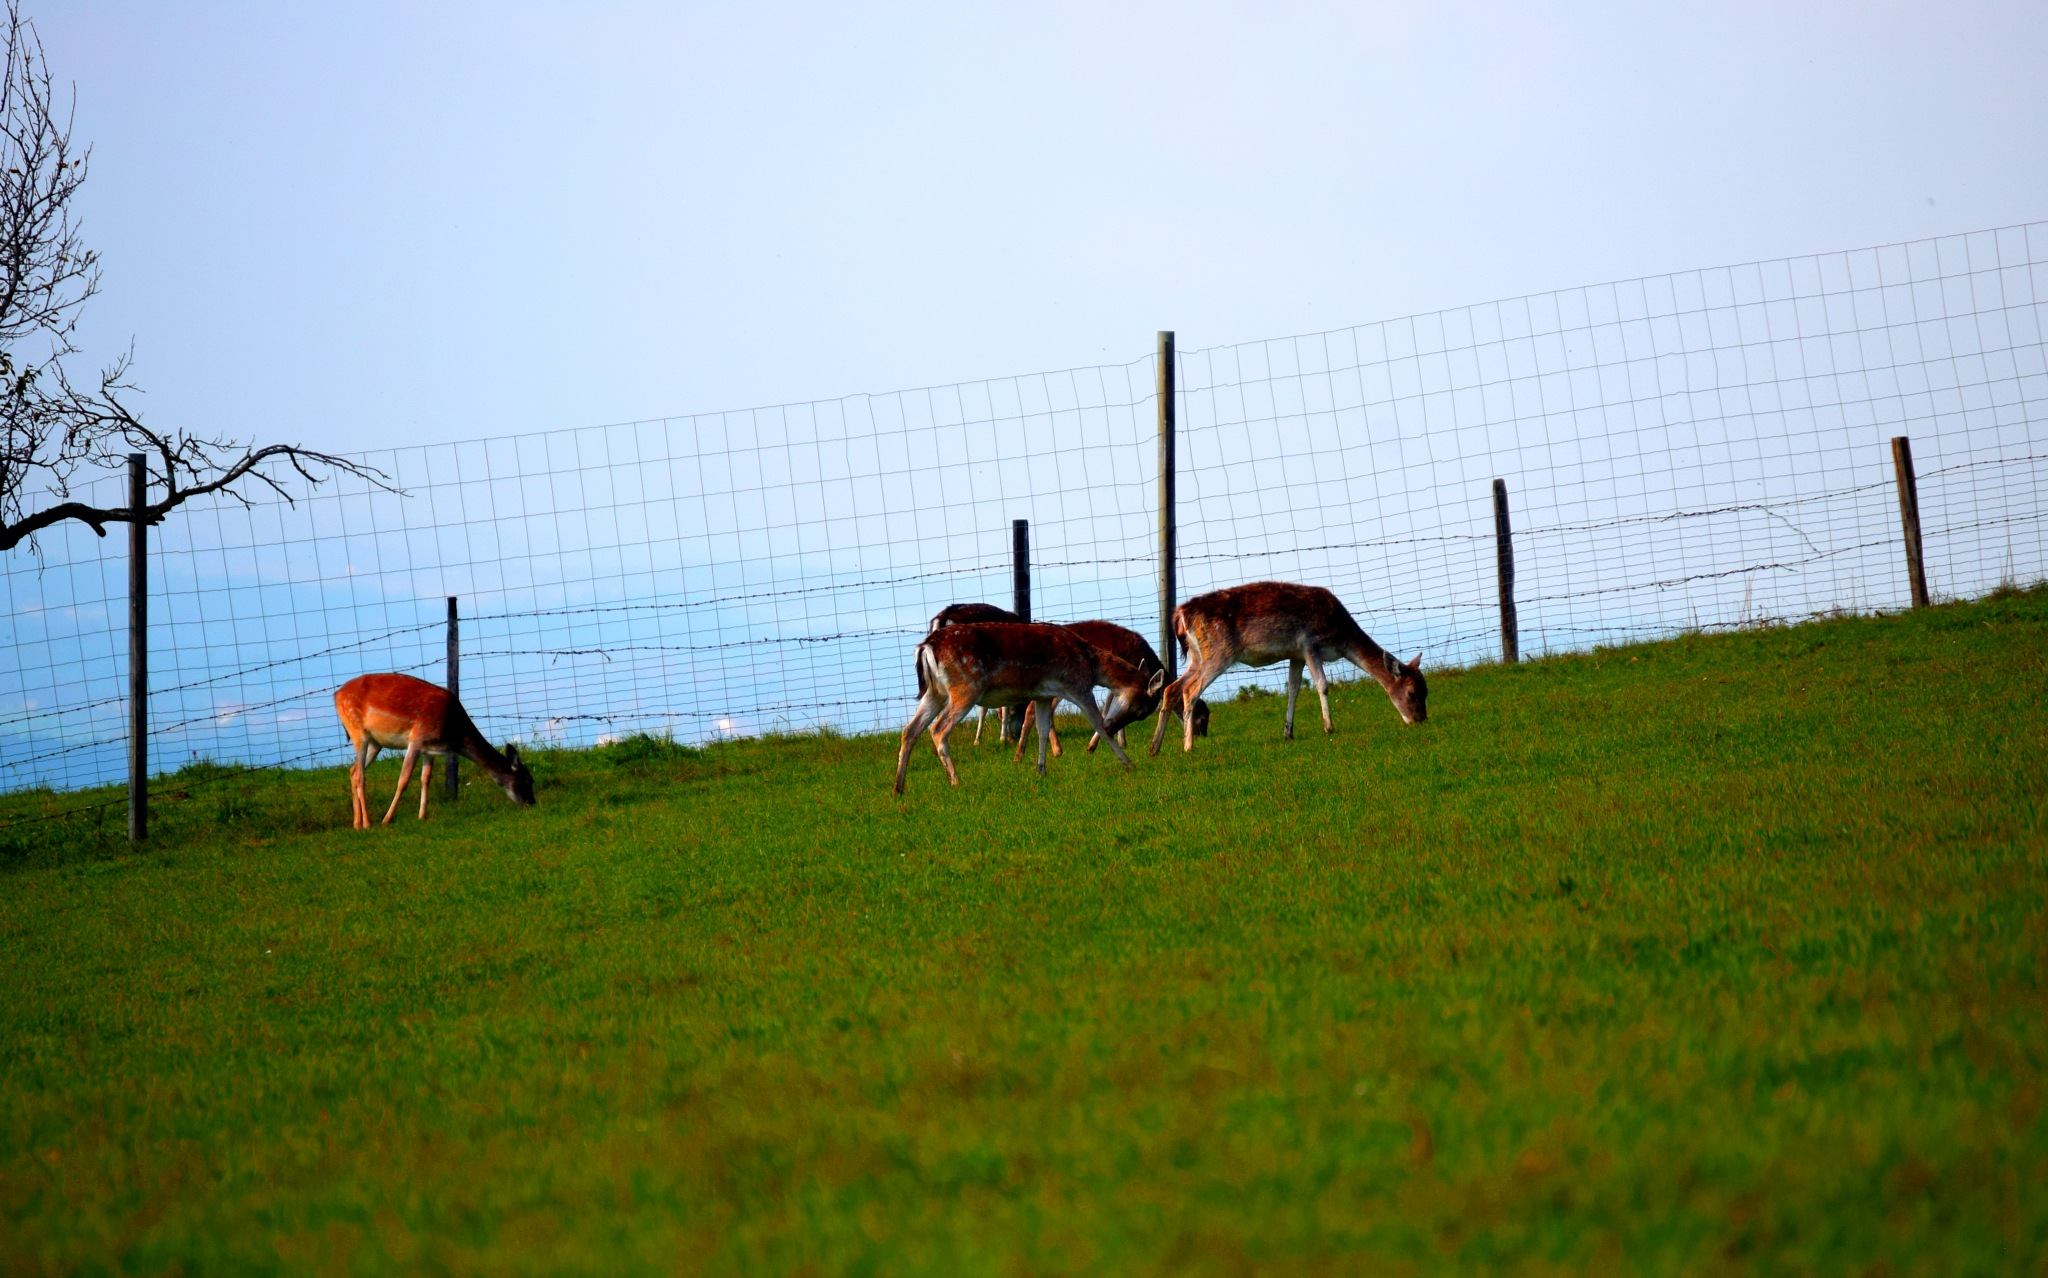 Deer Group searching for Food by PeterHaselstoner